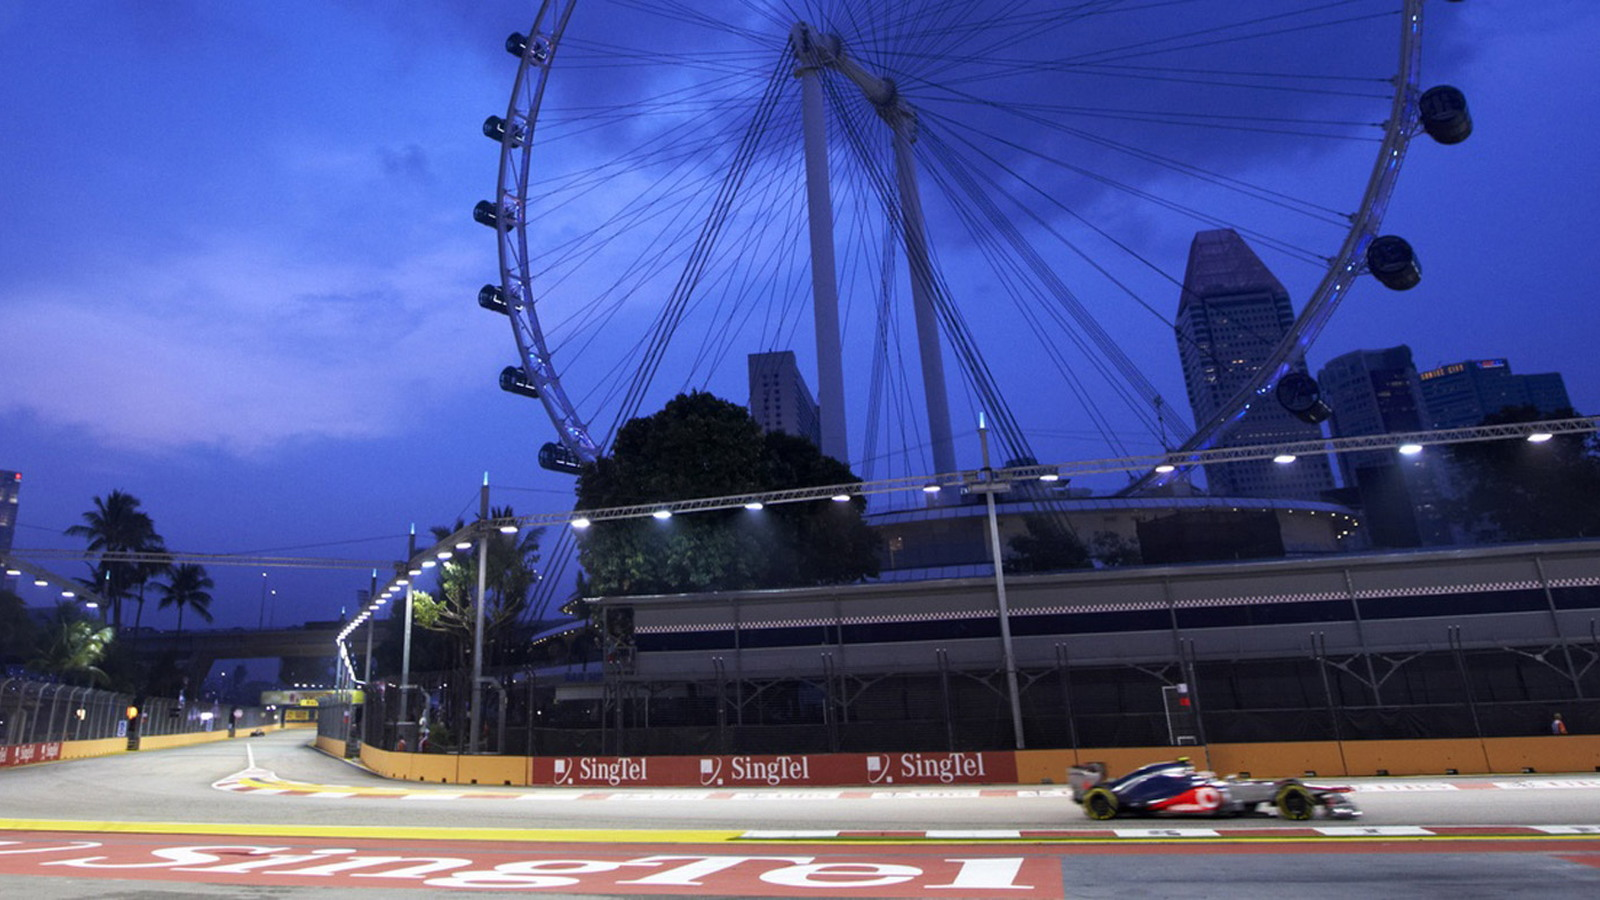 McLaren at the 2013 Formula One Singapore Grand Prix